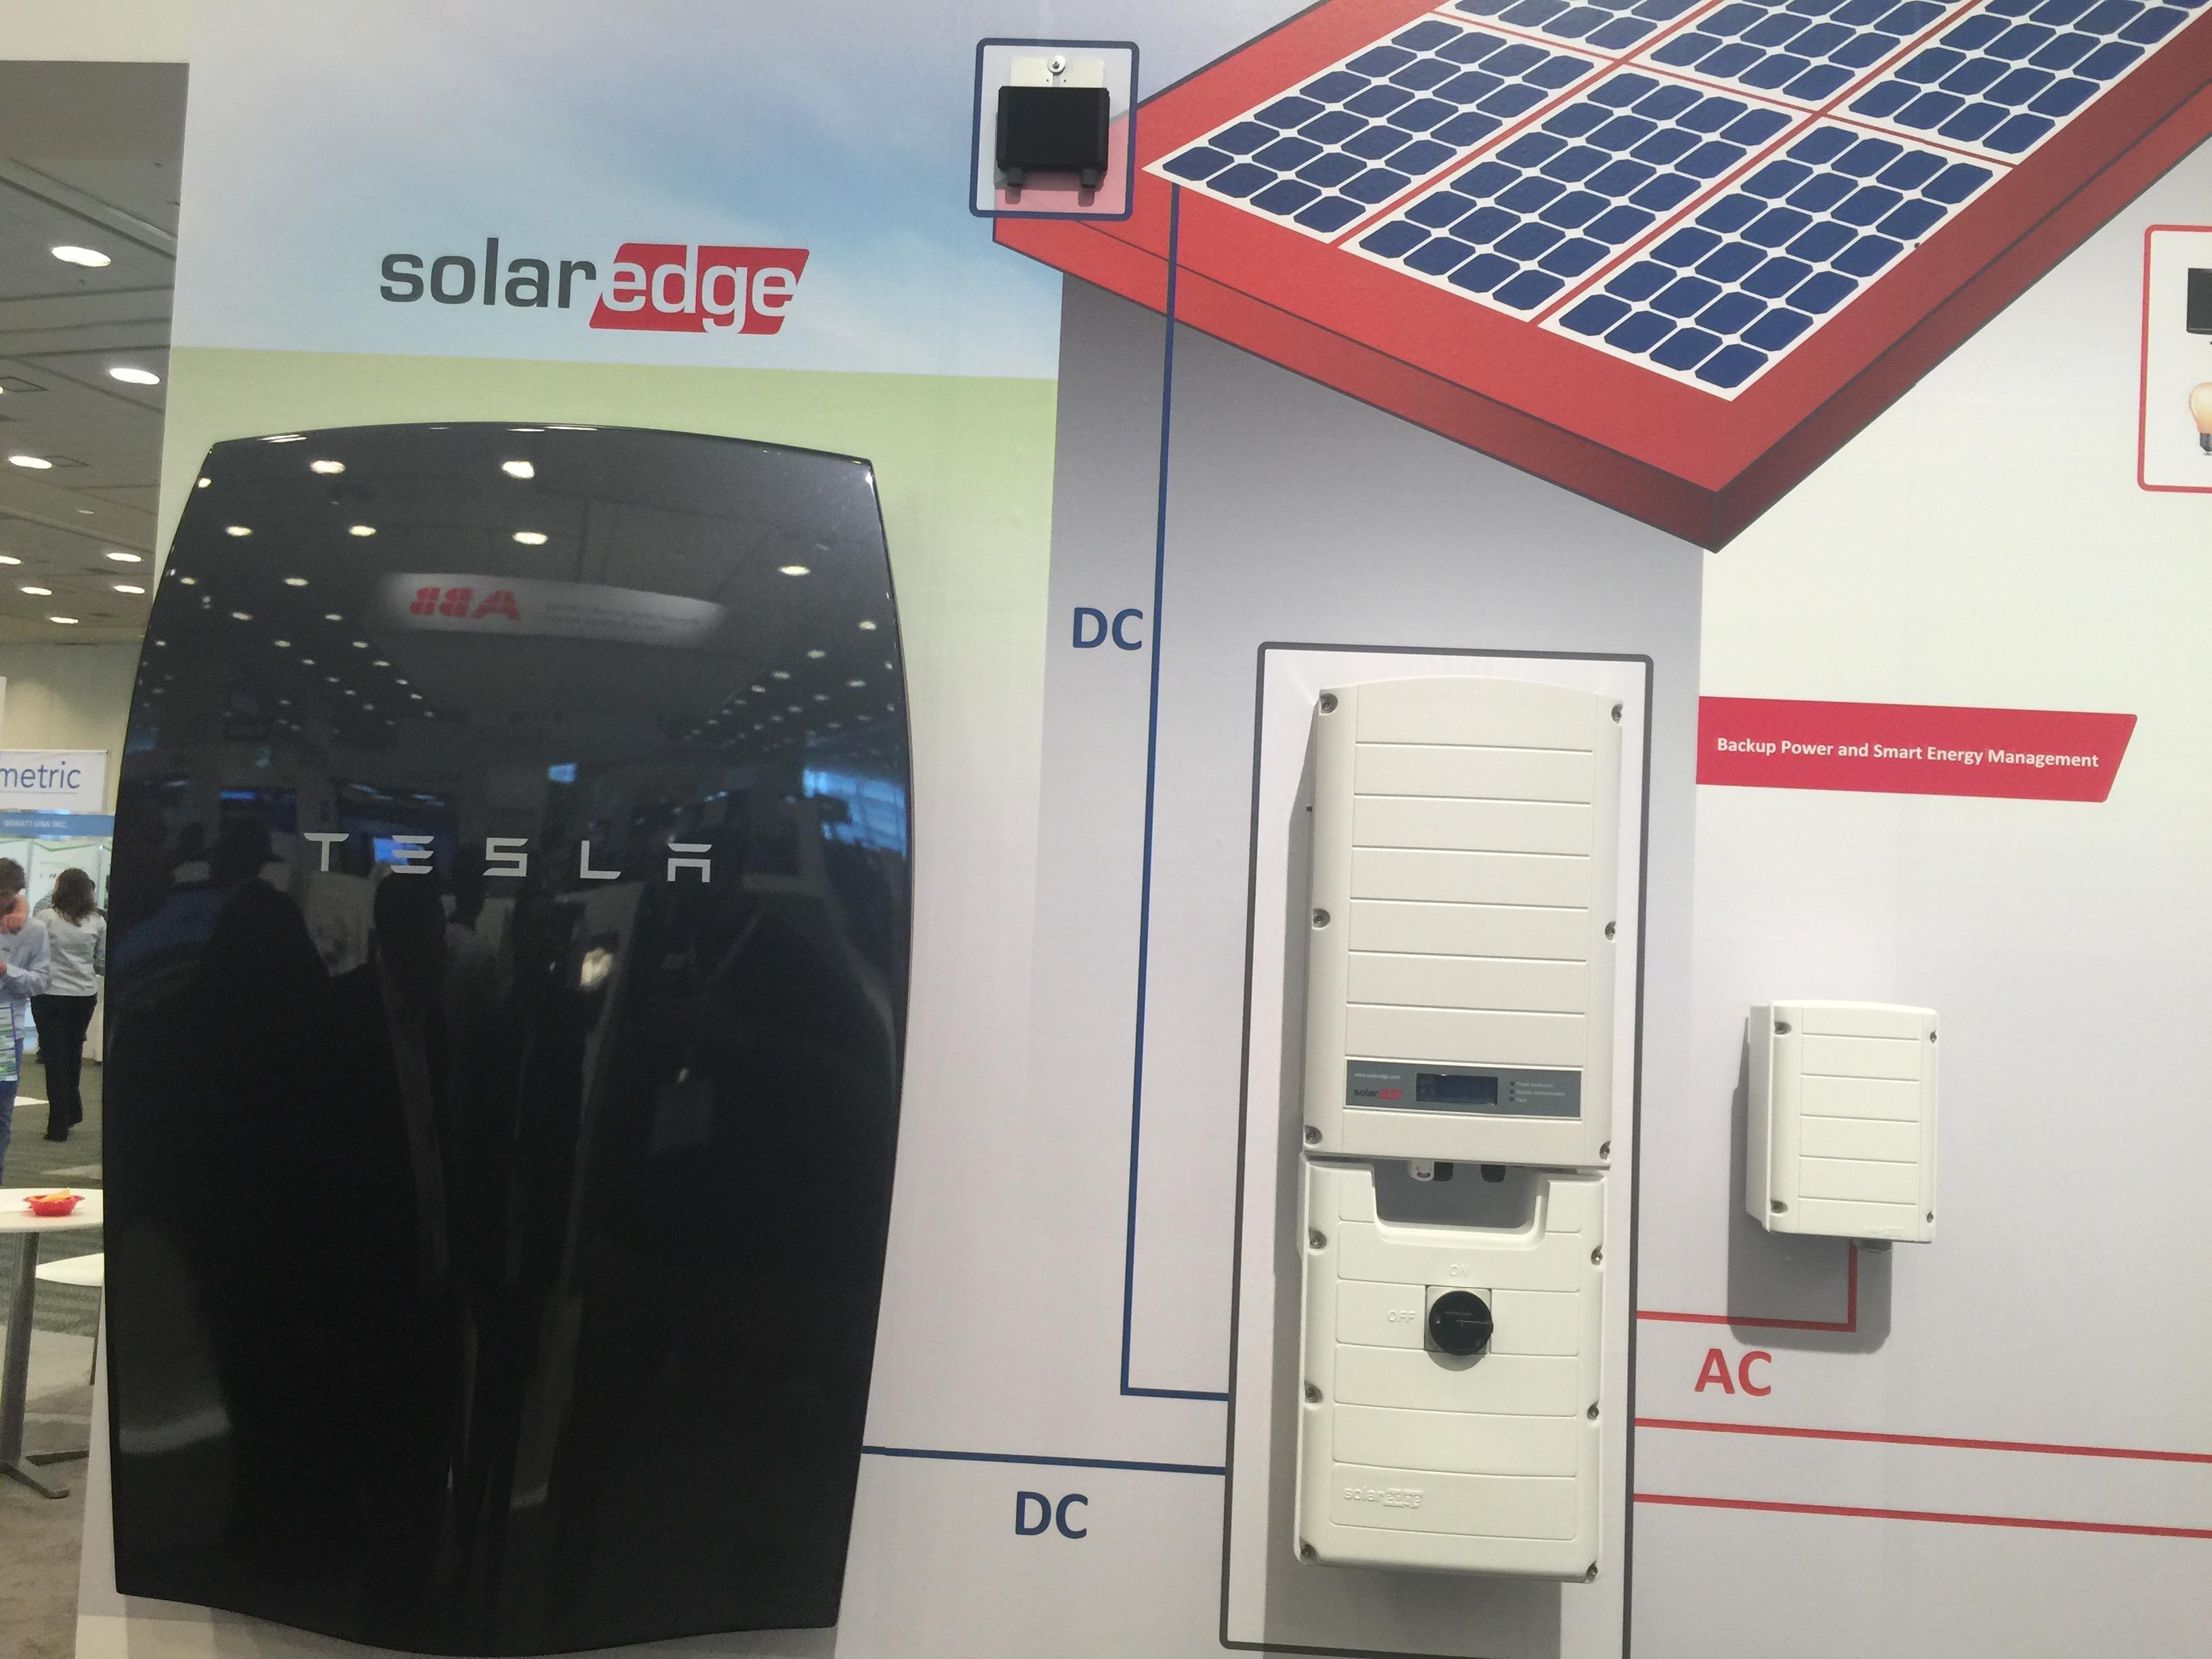 Tesla_Powerwall_and_Solar_Panels.jpg